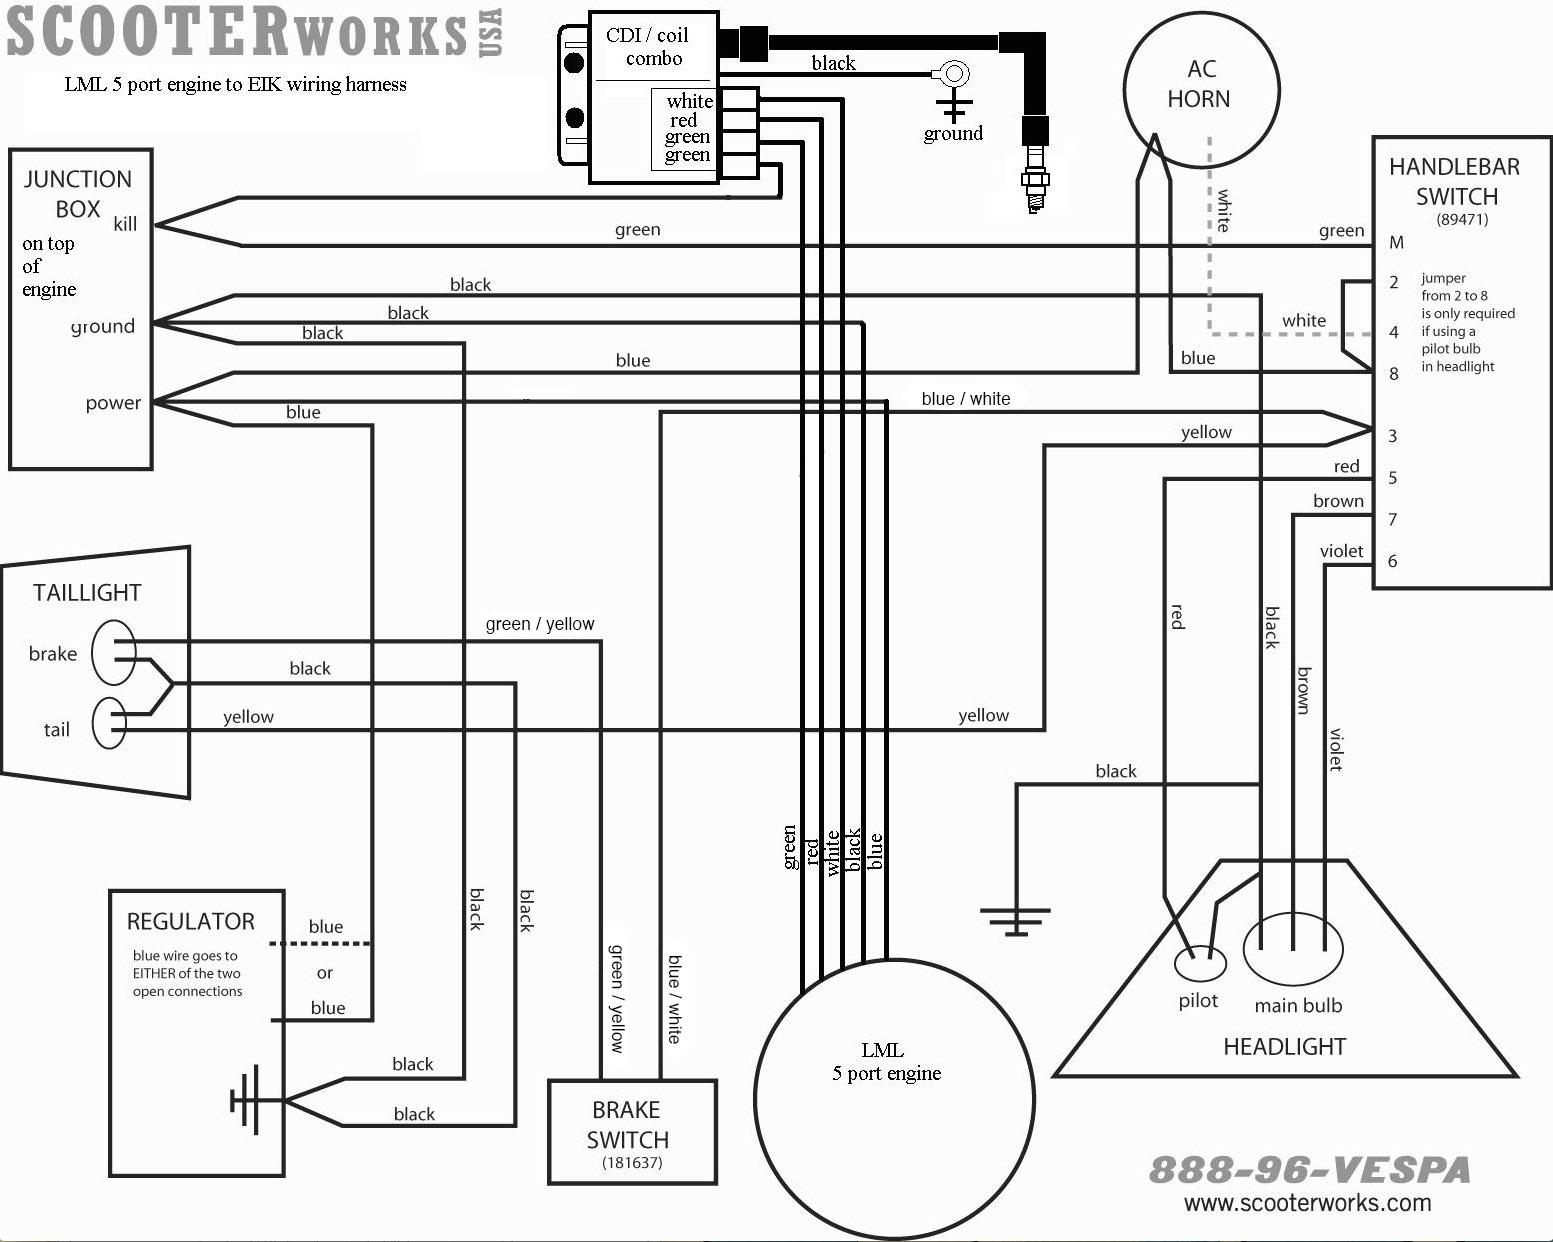 Pleasant Lml Vespa Wiring Diagram Basic Electronics Wiring Diagram Wiring Digital Resources Attrlexorcompassionincorg